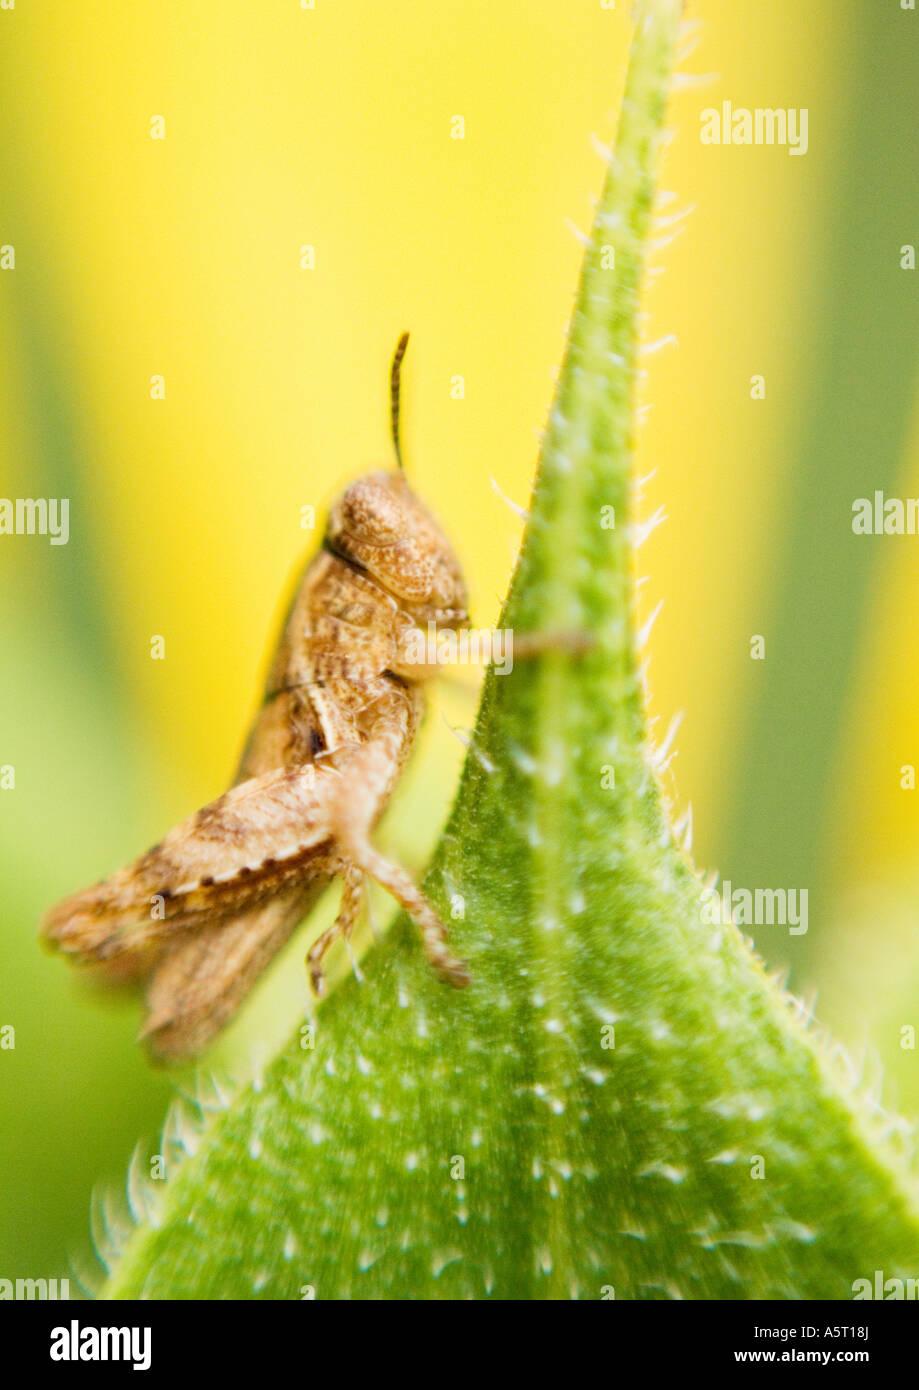 Grasshopper on leaf, extreme close-up - Stock Image